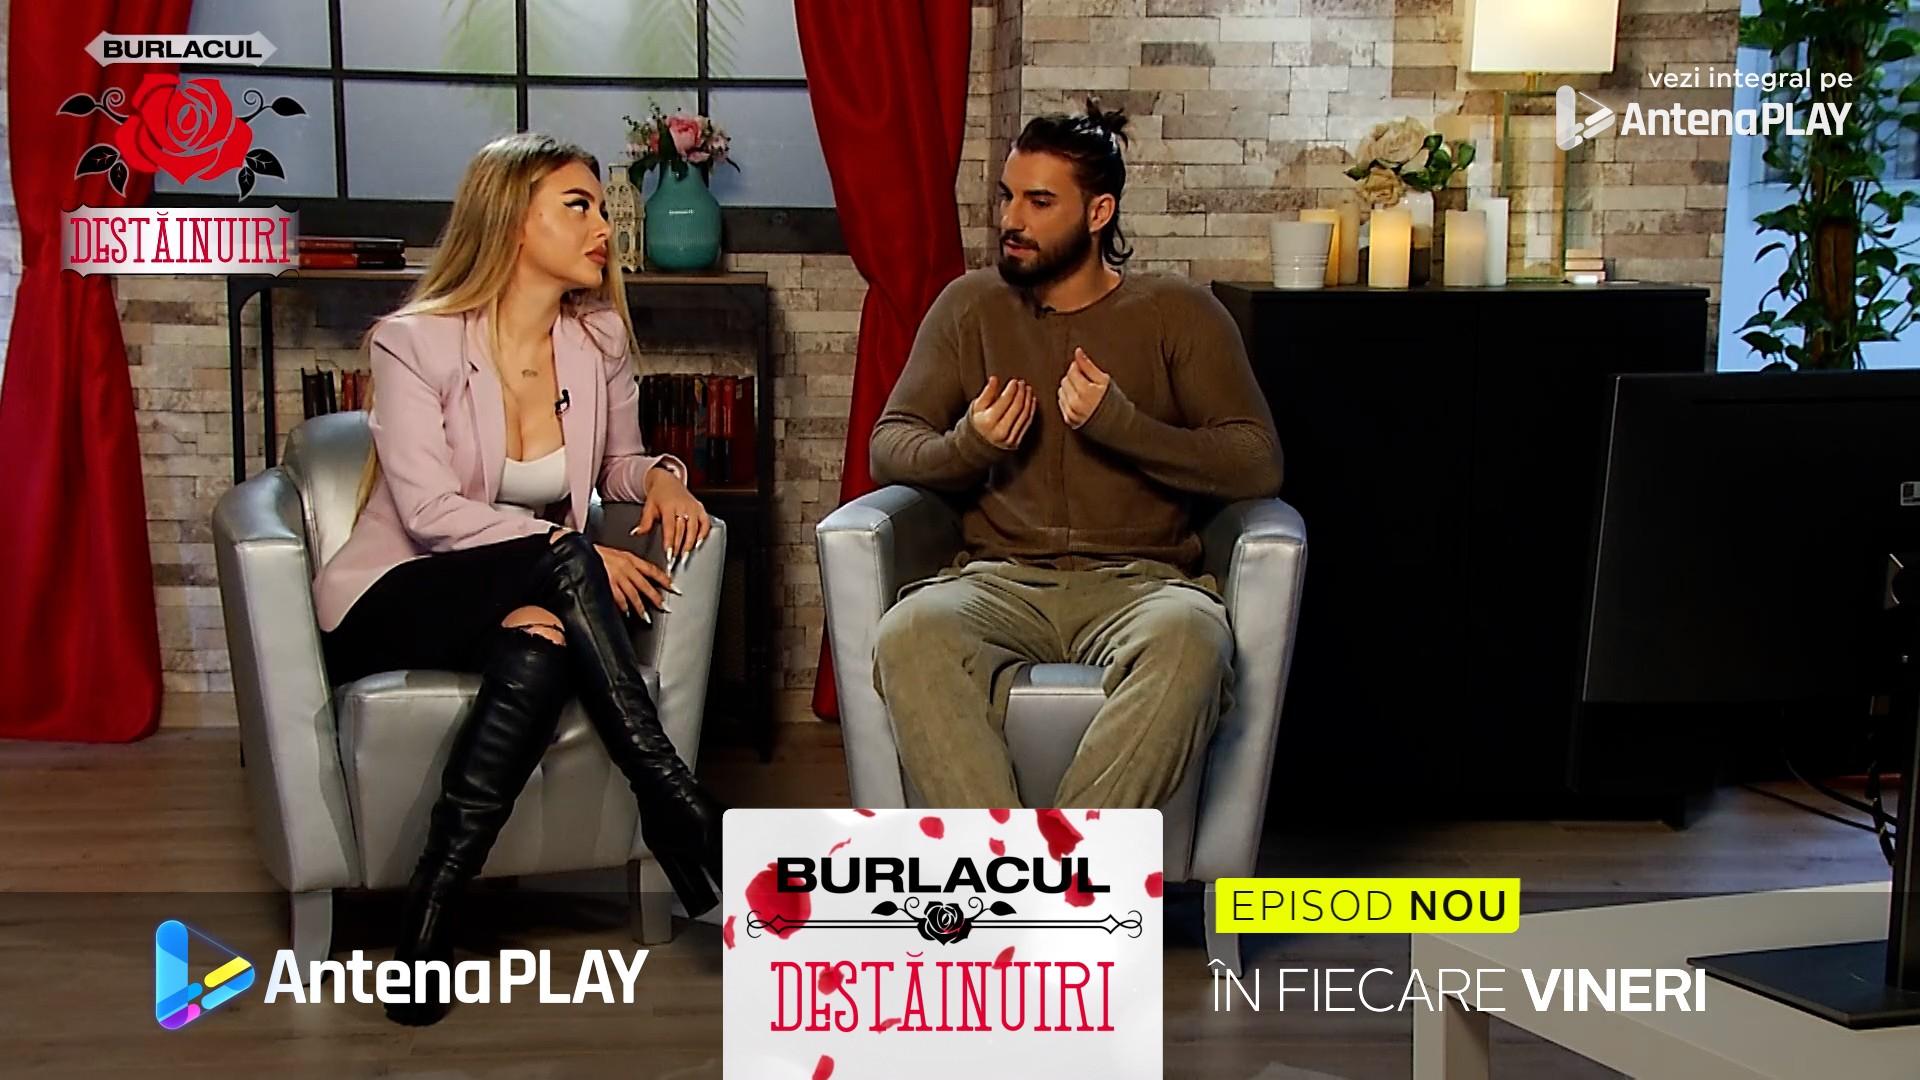 Burlacul - Destainuiri | Episodul 3